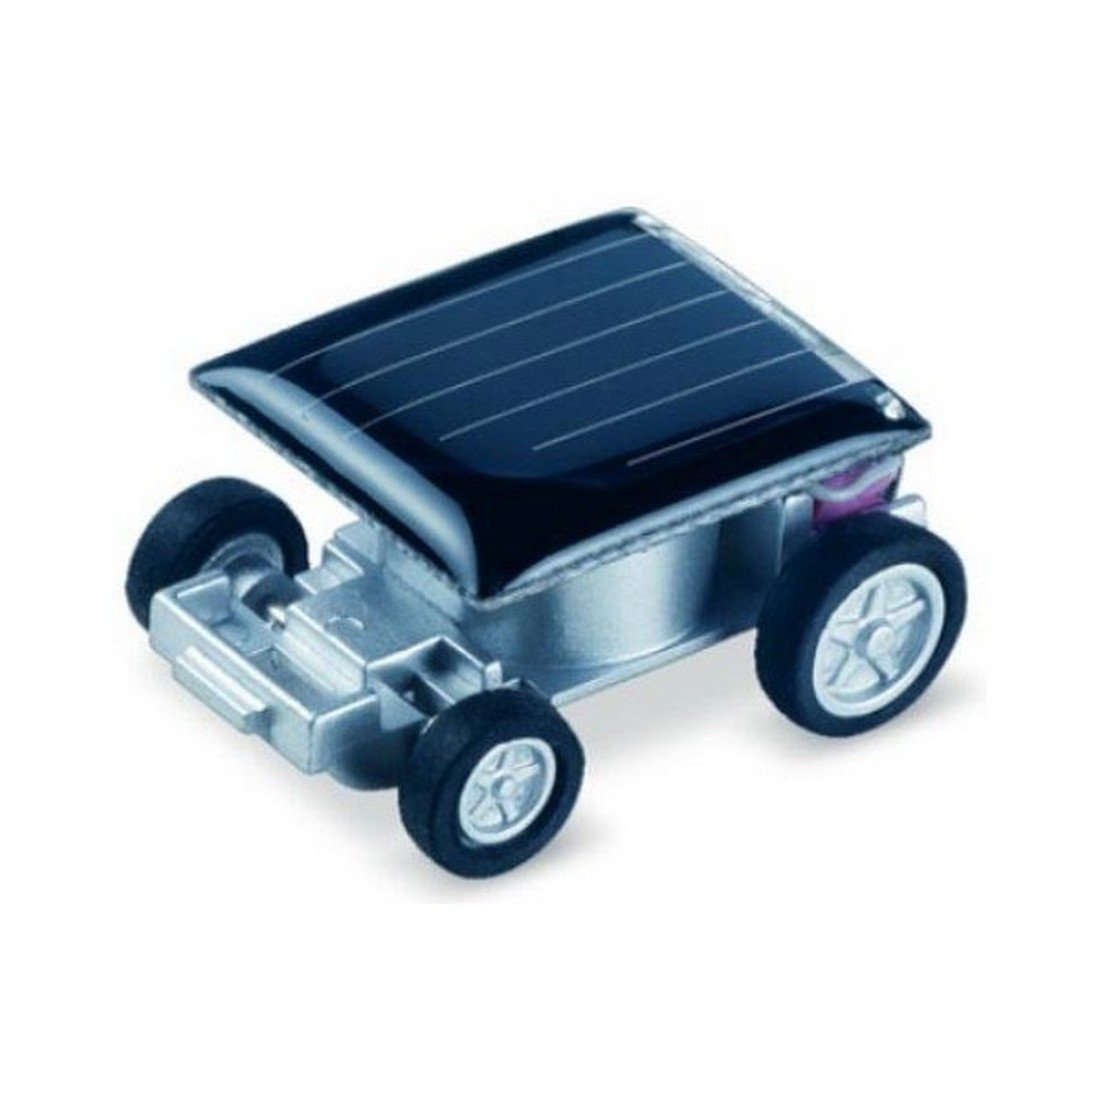 World's Smallest Solar Powered Car